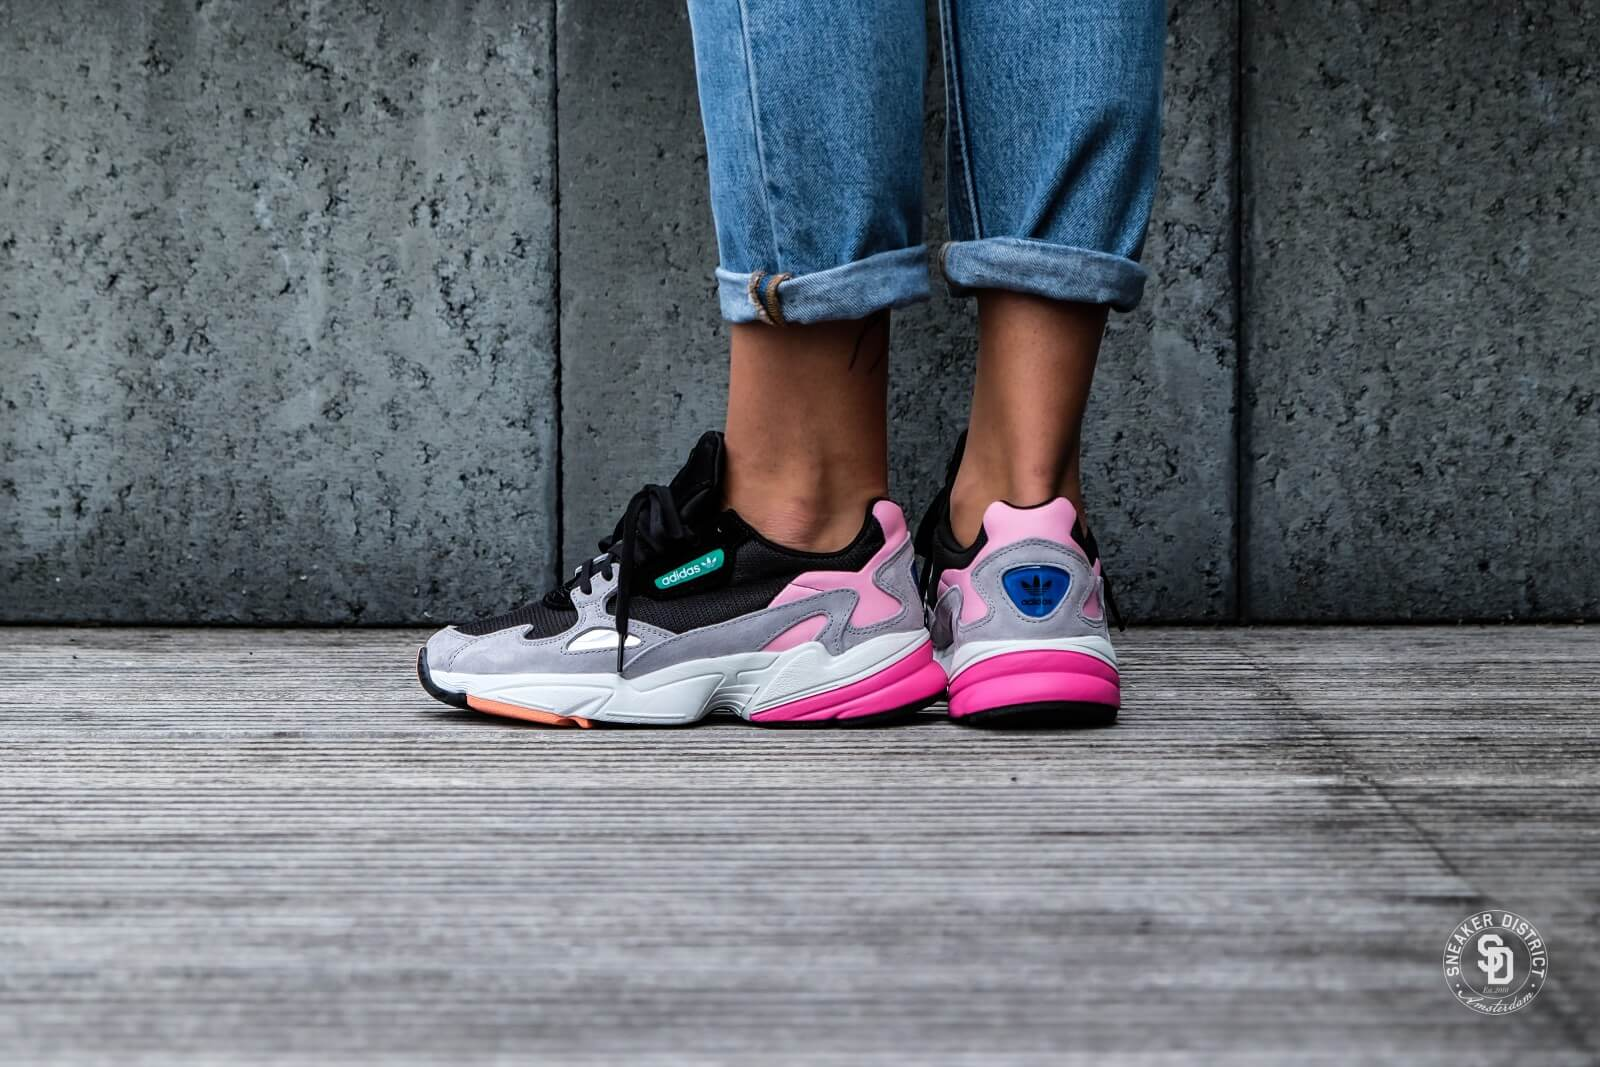 half off buy online new appearance Adidas Women